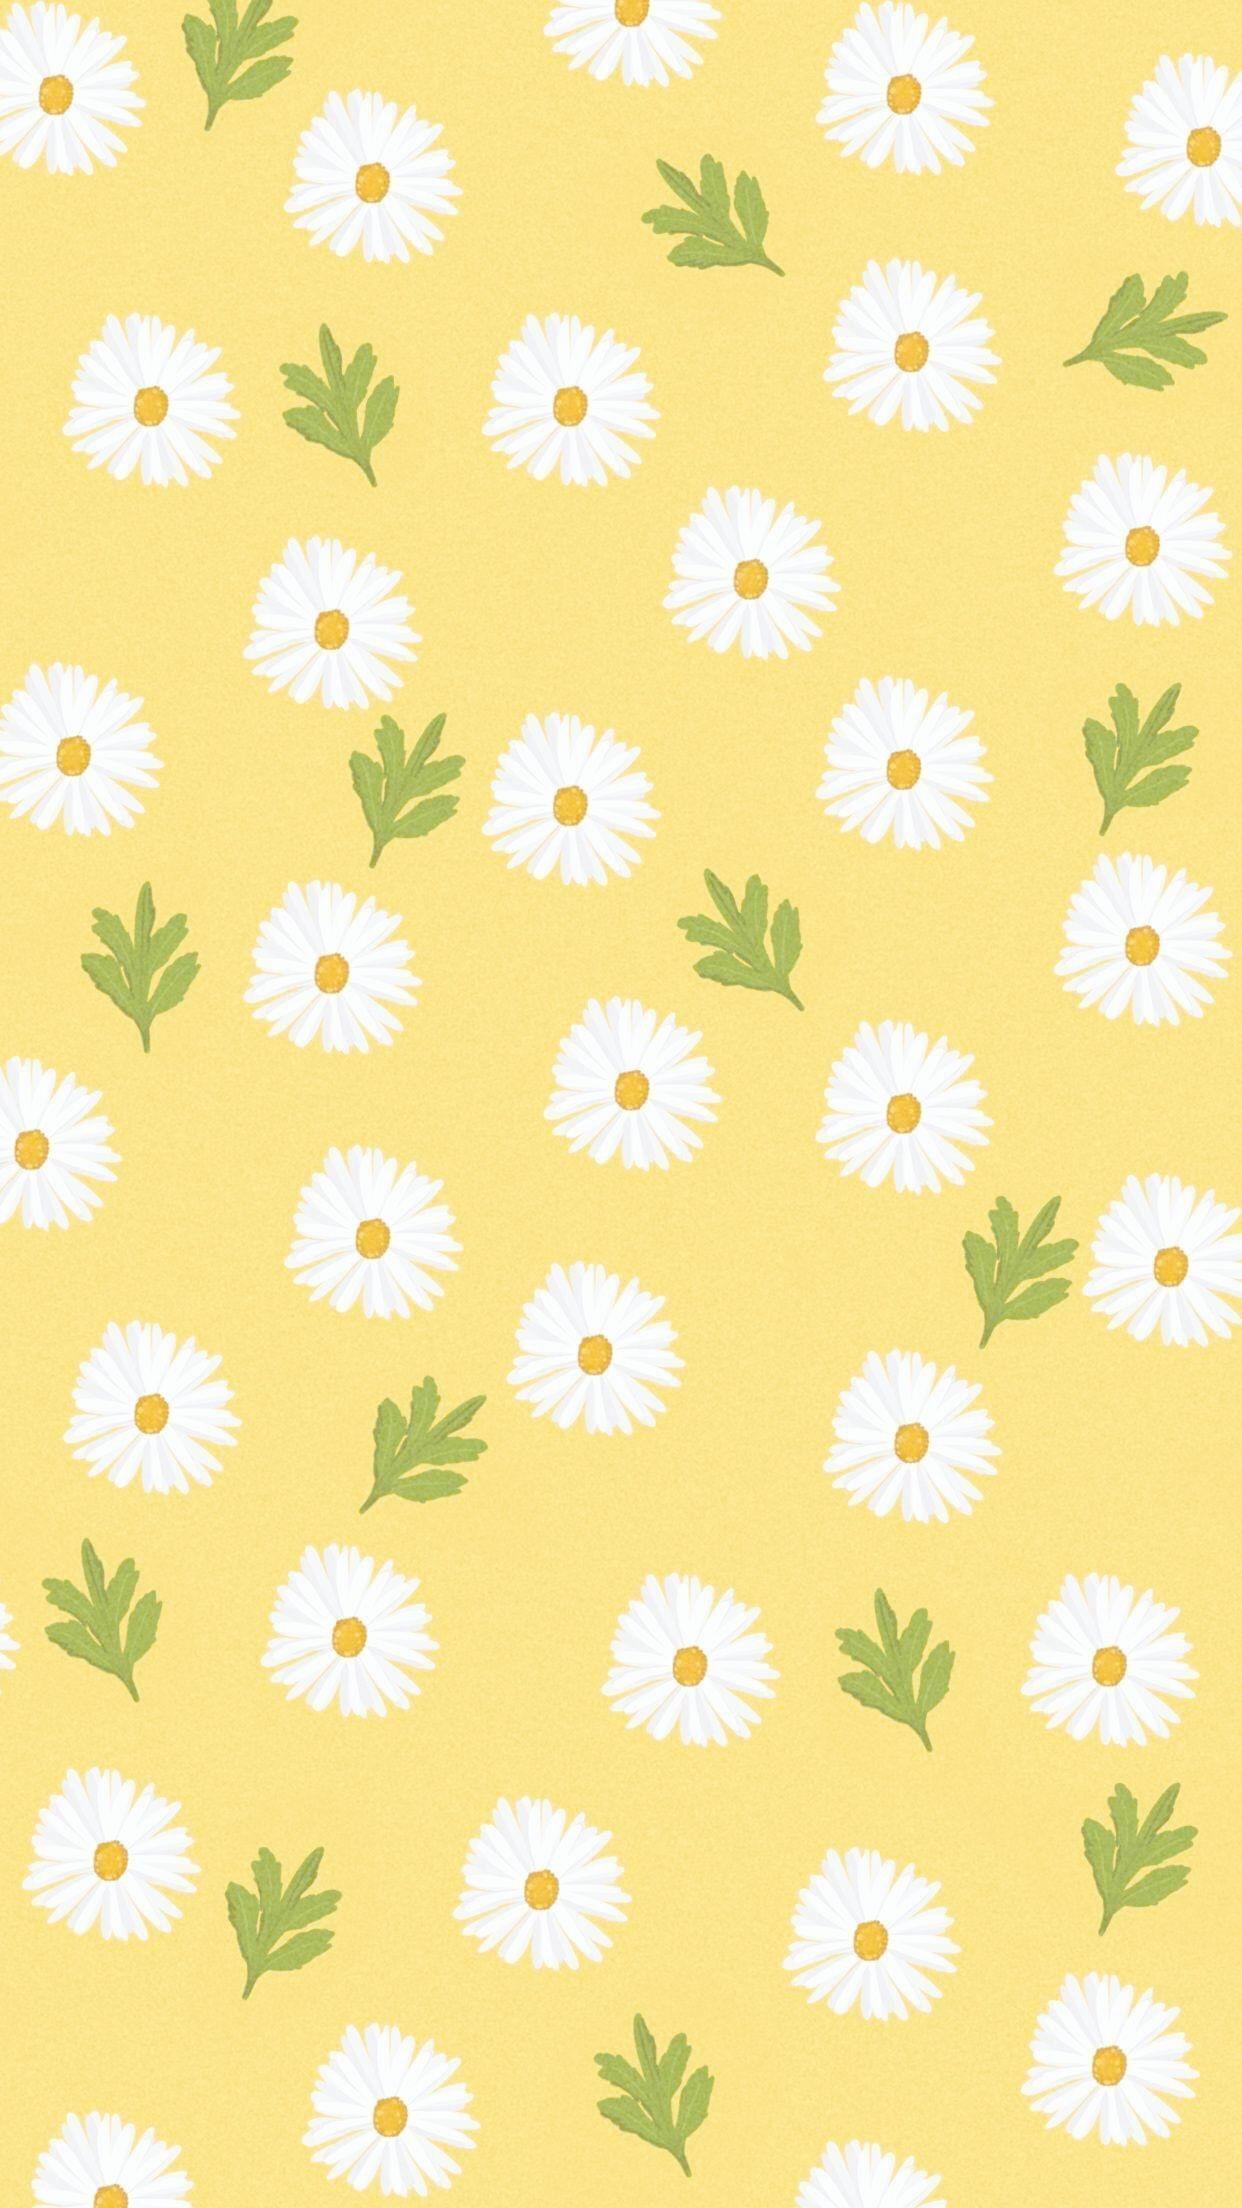 Daisies Wallpaper Iphone Daisies Iphone Wallpaper Daisies Iphone Iphonedaisi Daisies Iphone I Daisy Wallpaper Yellow Wallpaper Cute Patterns Wallpaper